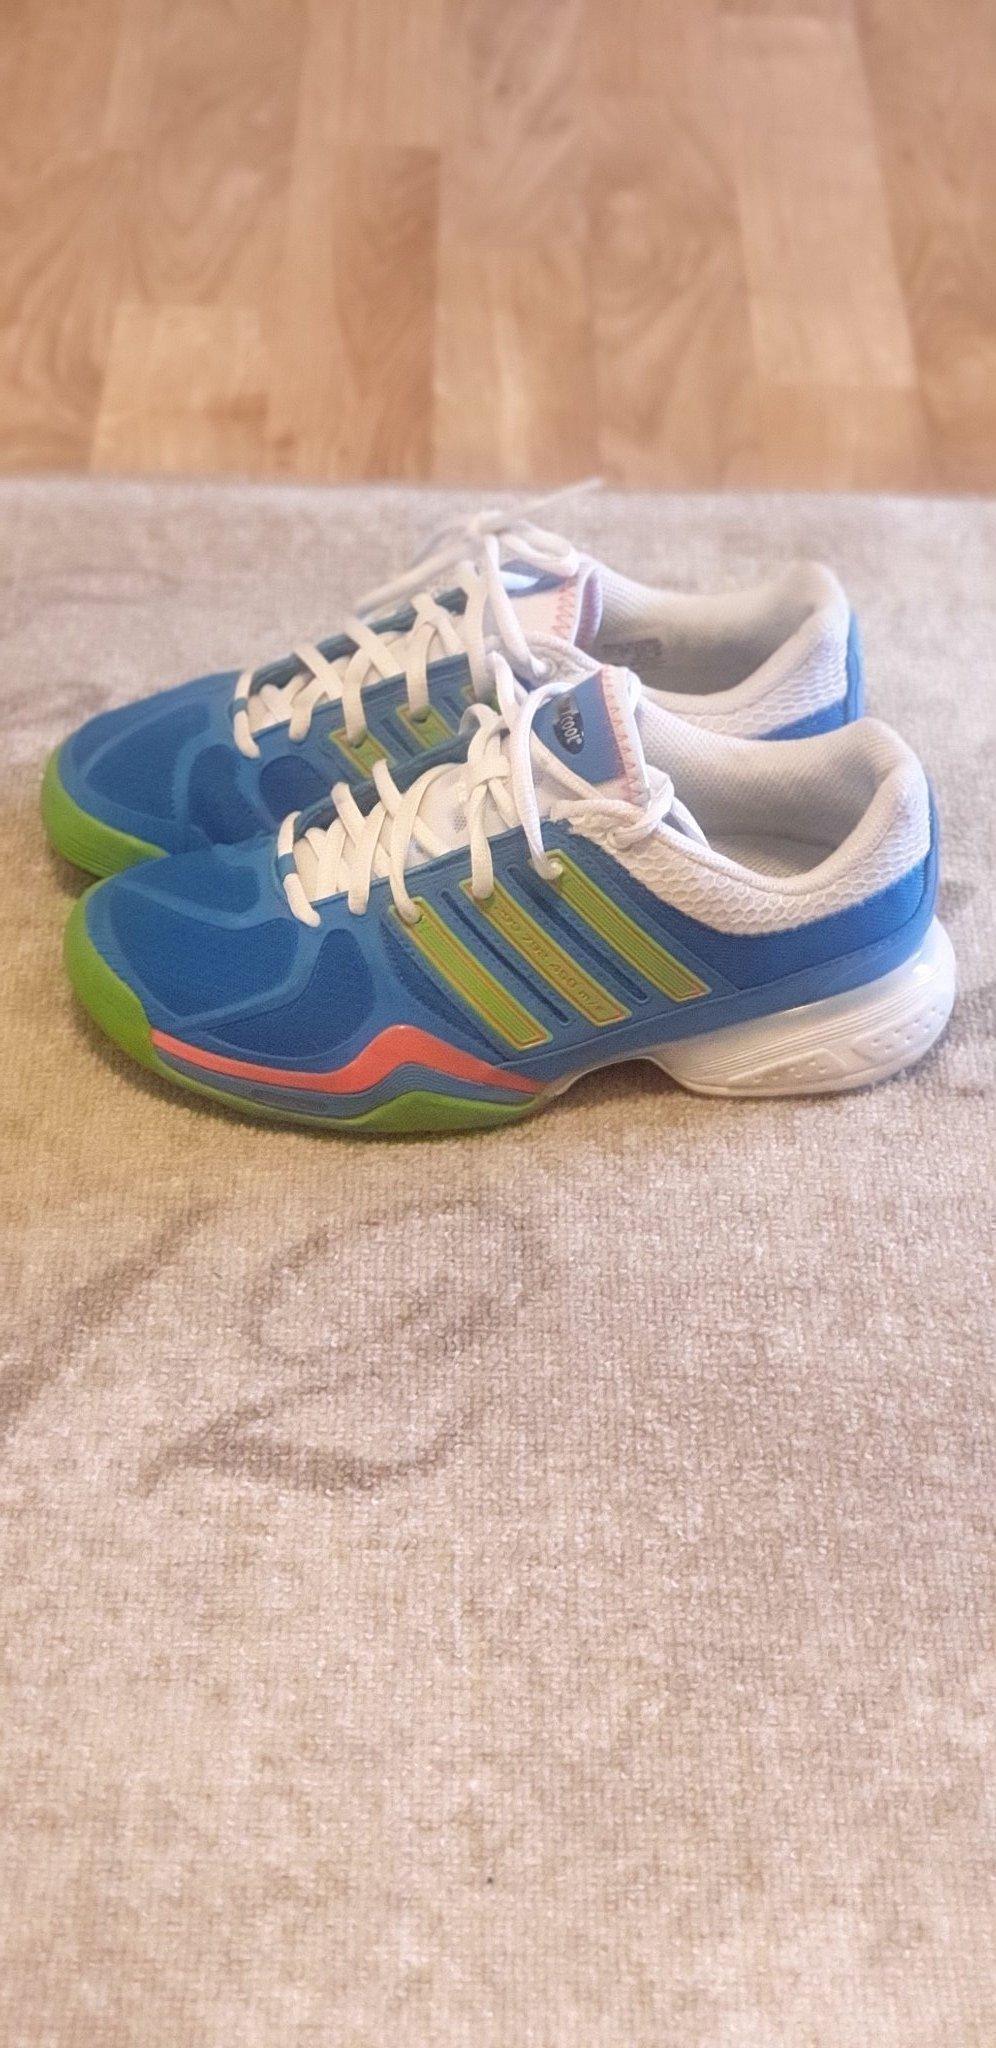 Adidas skor dam storlek